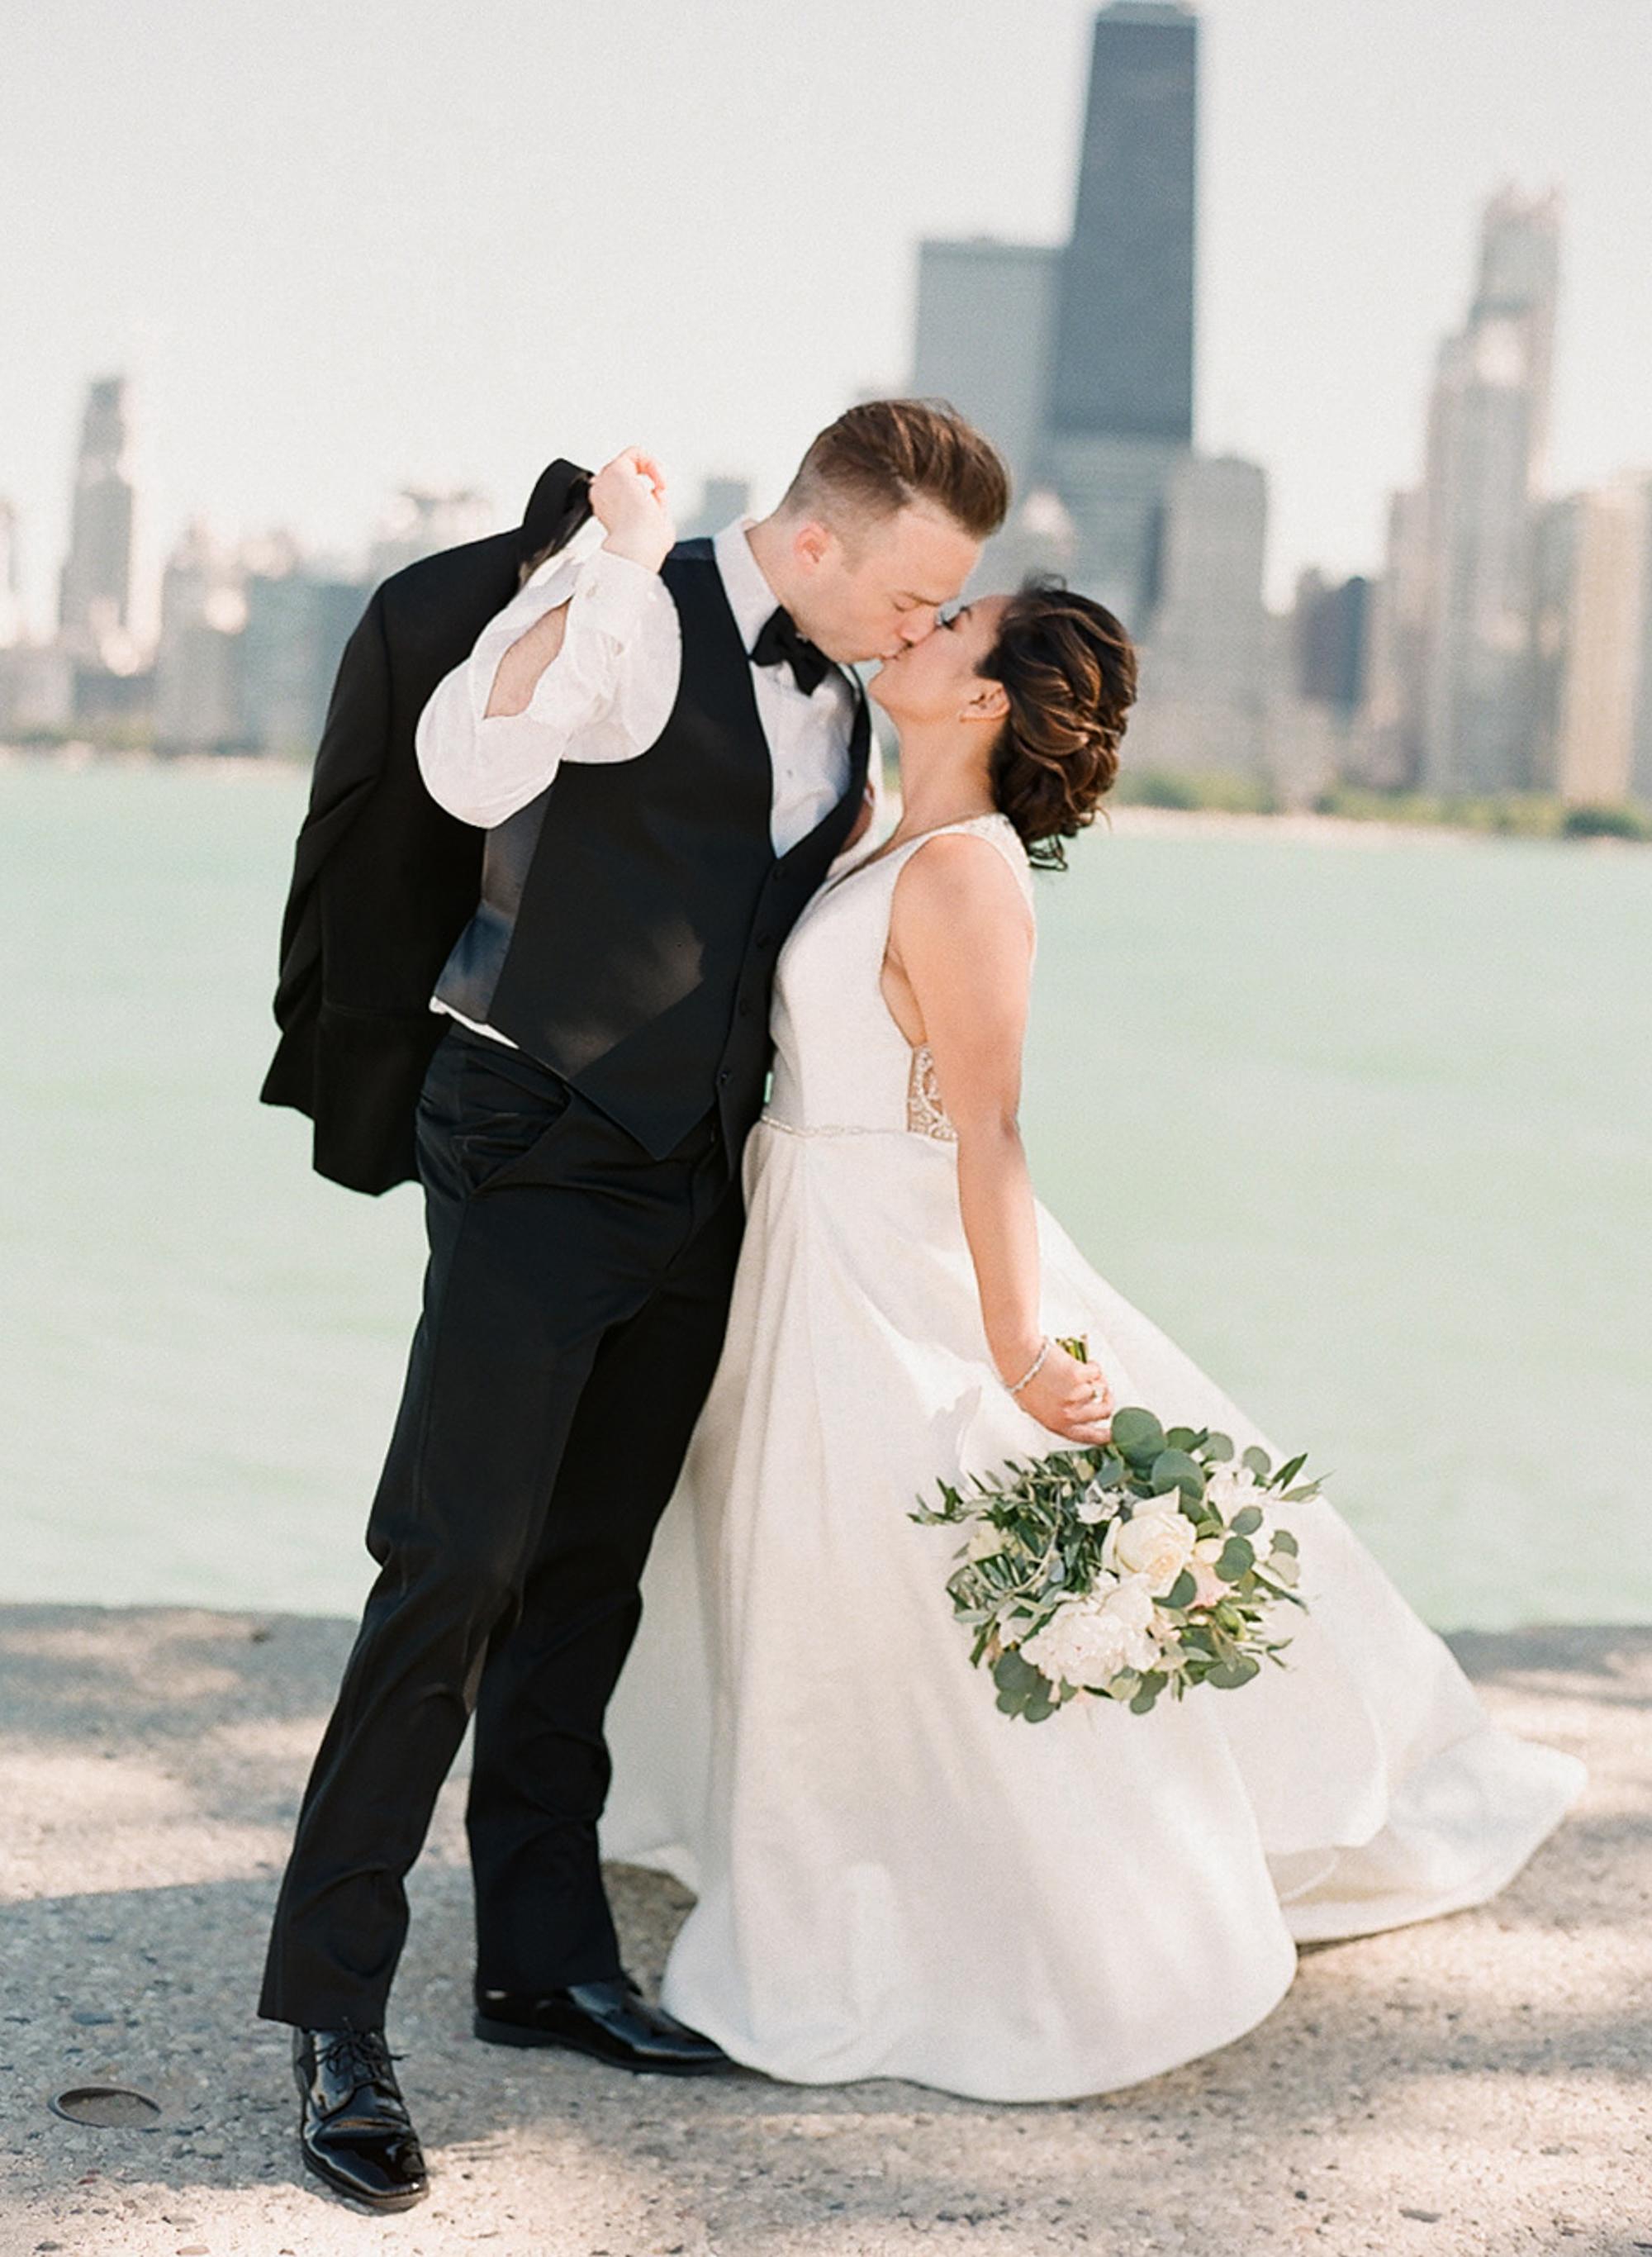 Bonphotage Chicago Fine Art Wedding Photography - The Drake Hotel